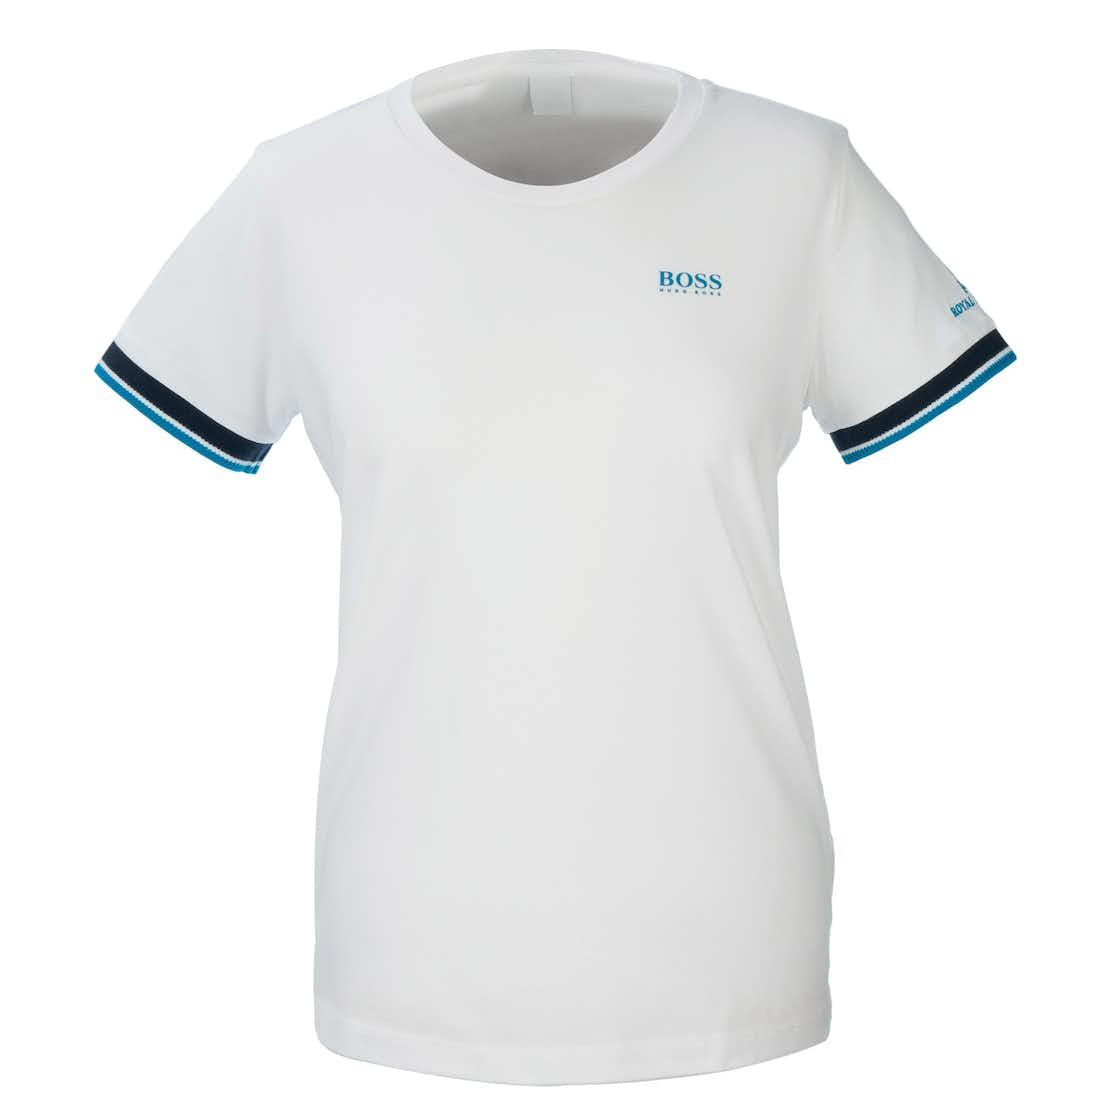 148th Royal Portrush BOSS Crew-Neck T-Shirt - White